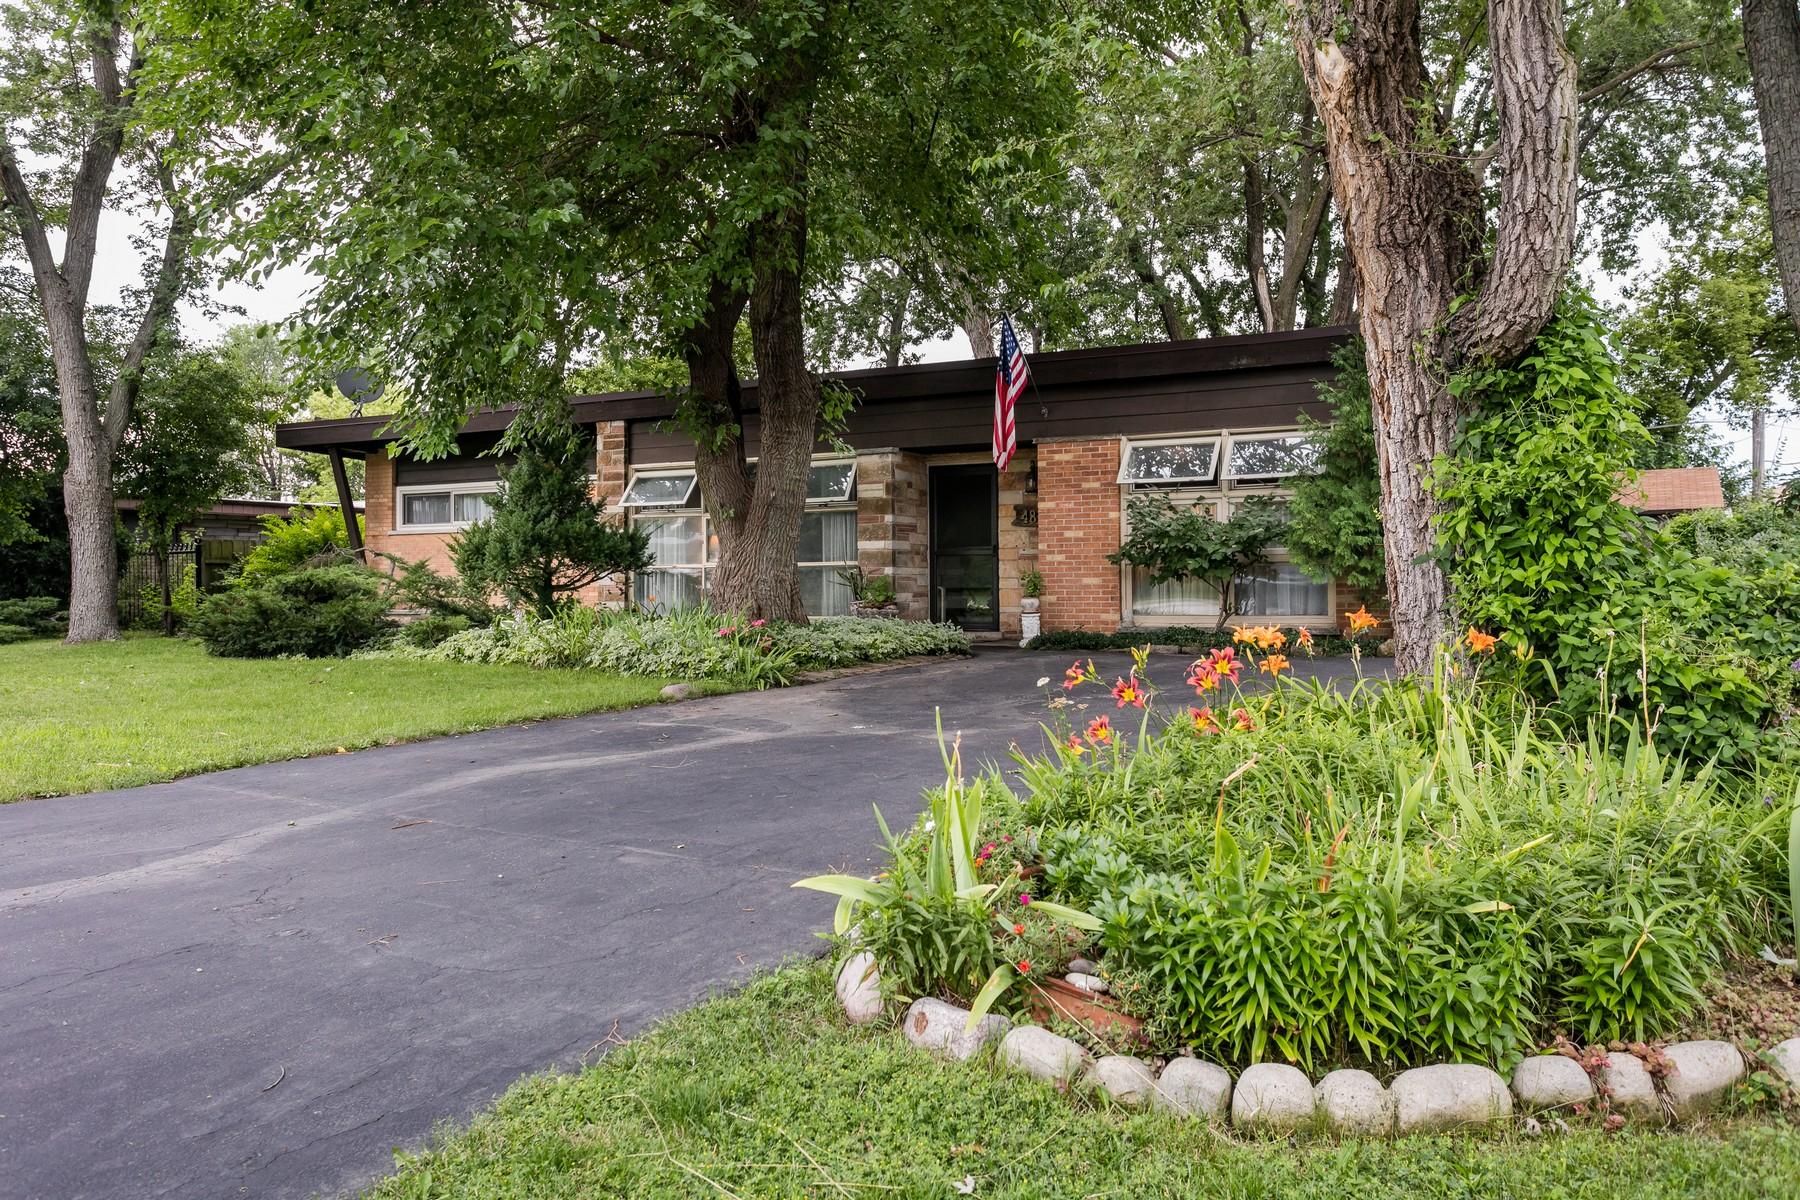 Casa para uma família para Venda às Ranch Home in Norridge 4820 N Vine Avenue Norridge, Illinois, 60706 Estados Unidos